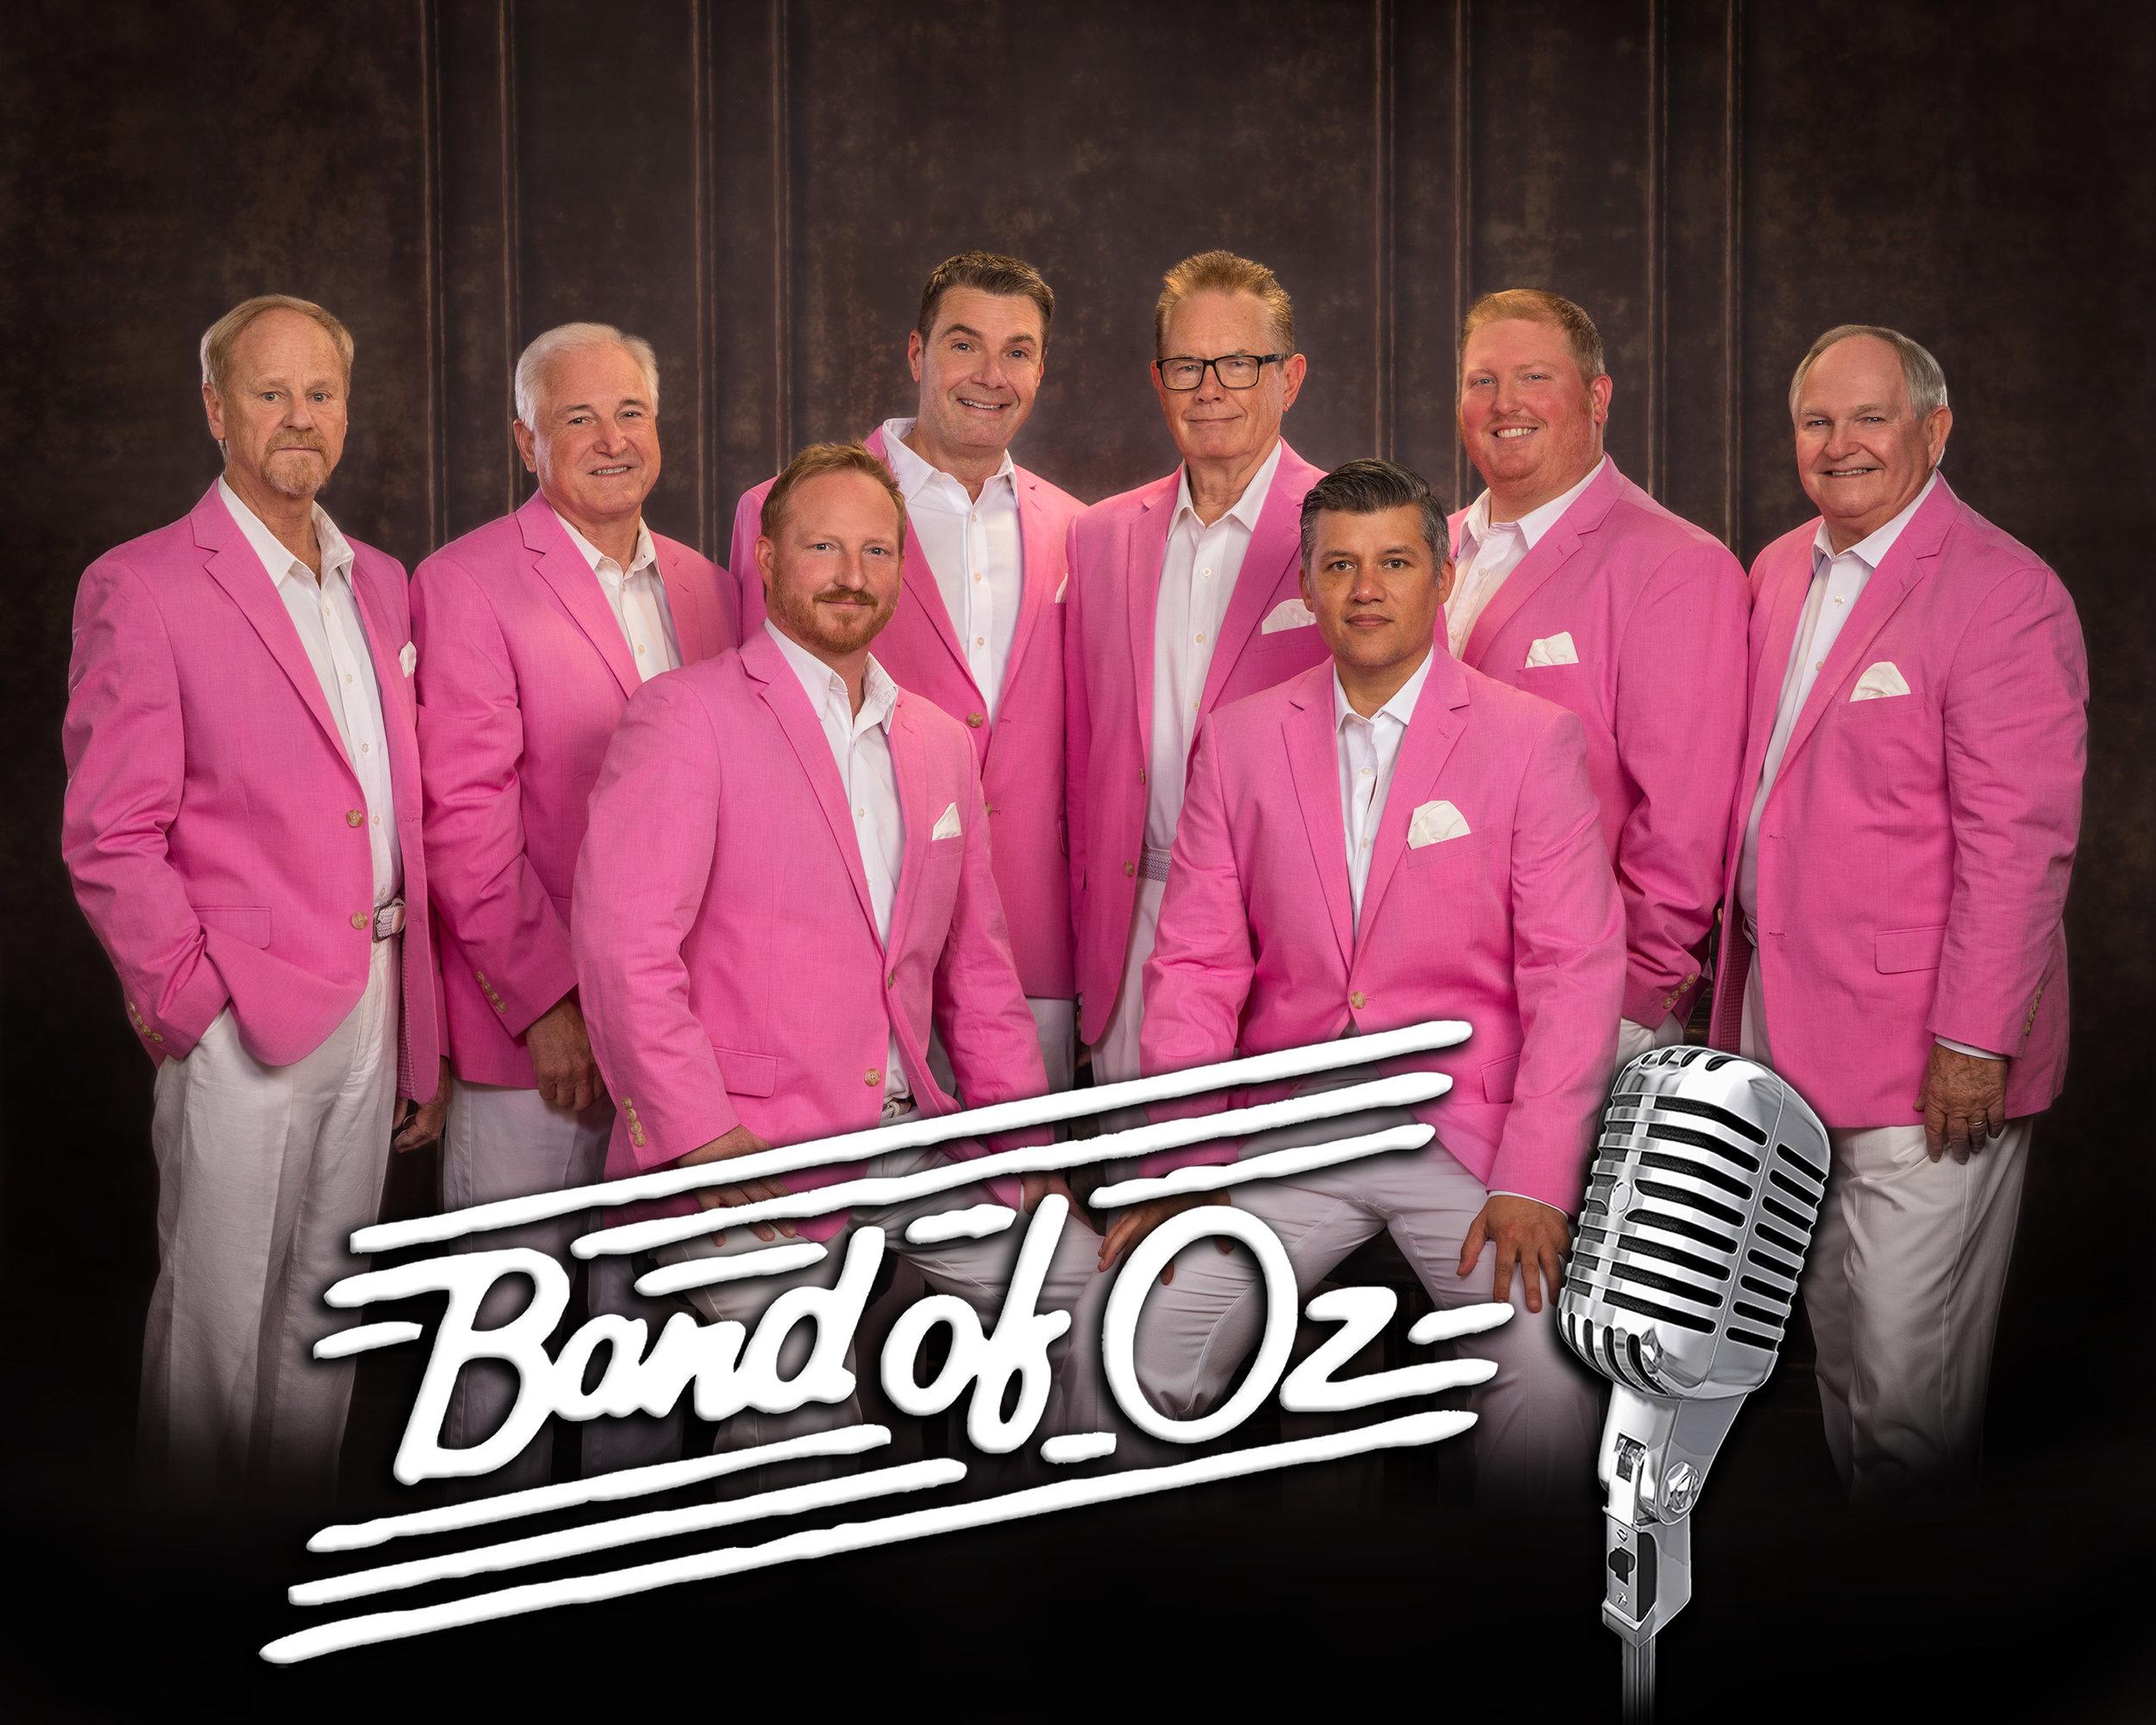 Band of Oz.jpg